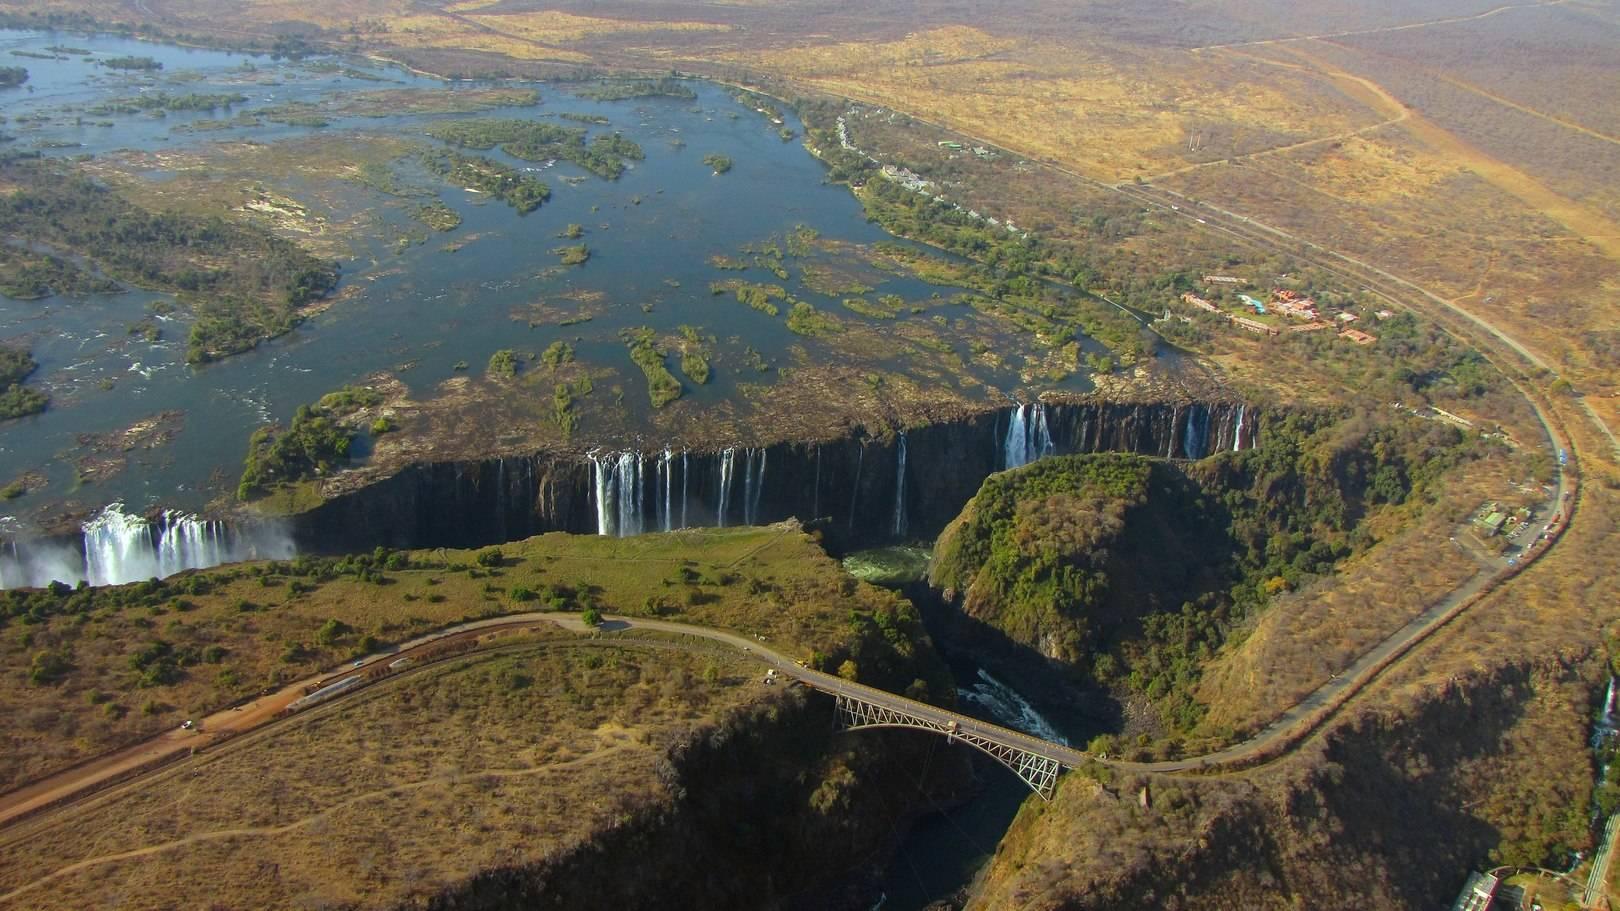 Водопад Виктория на границе Замбии и Зимбабве.